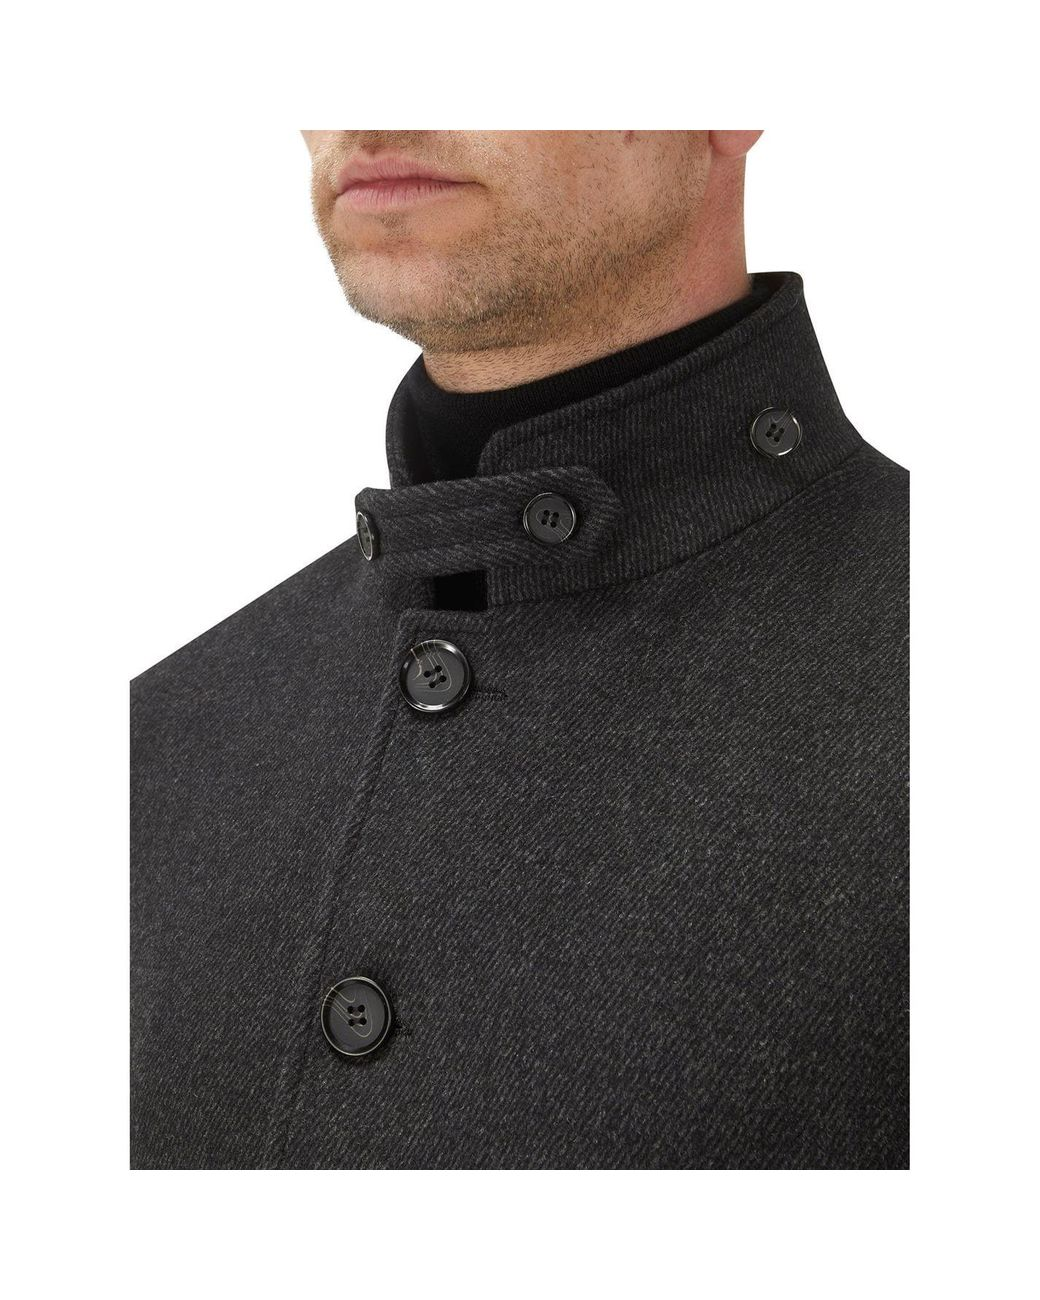 Ledbury SKOPES Mens Big Size Cotton Blend Shower Proof Raincoat